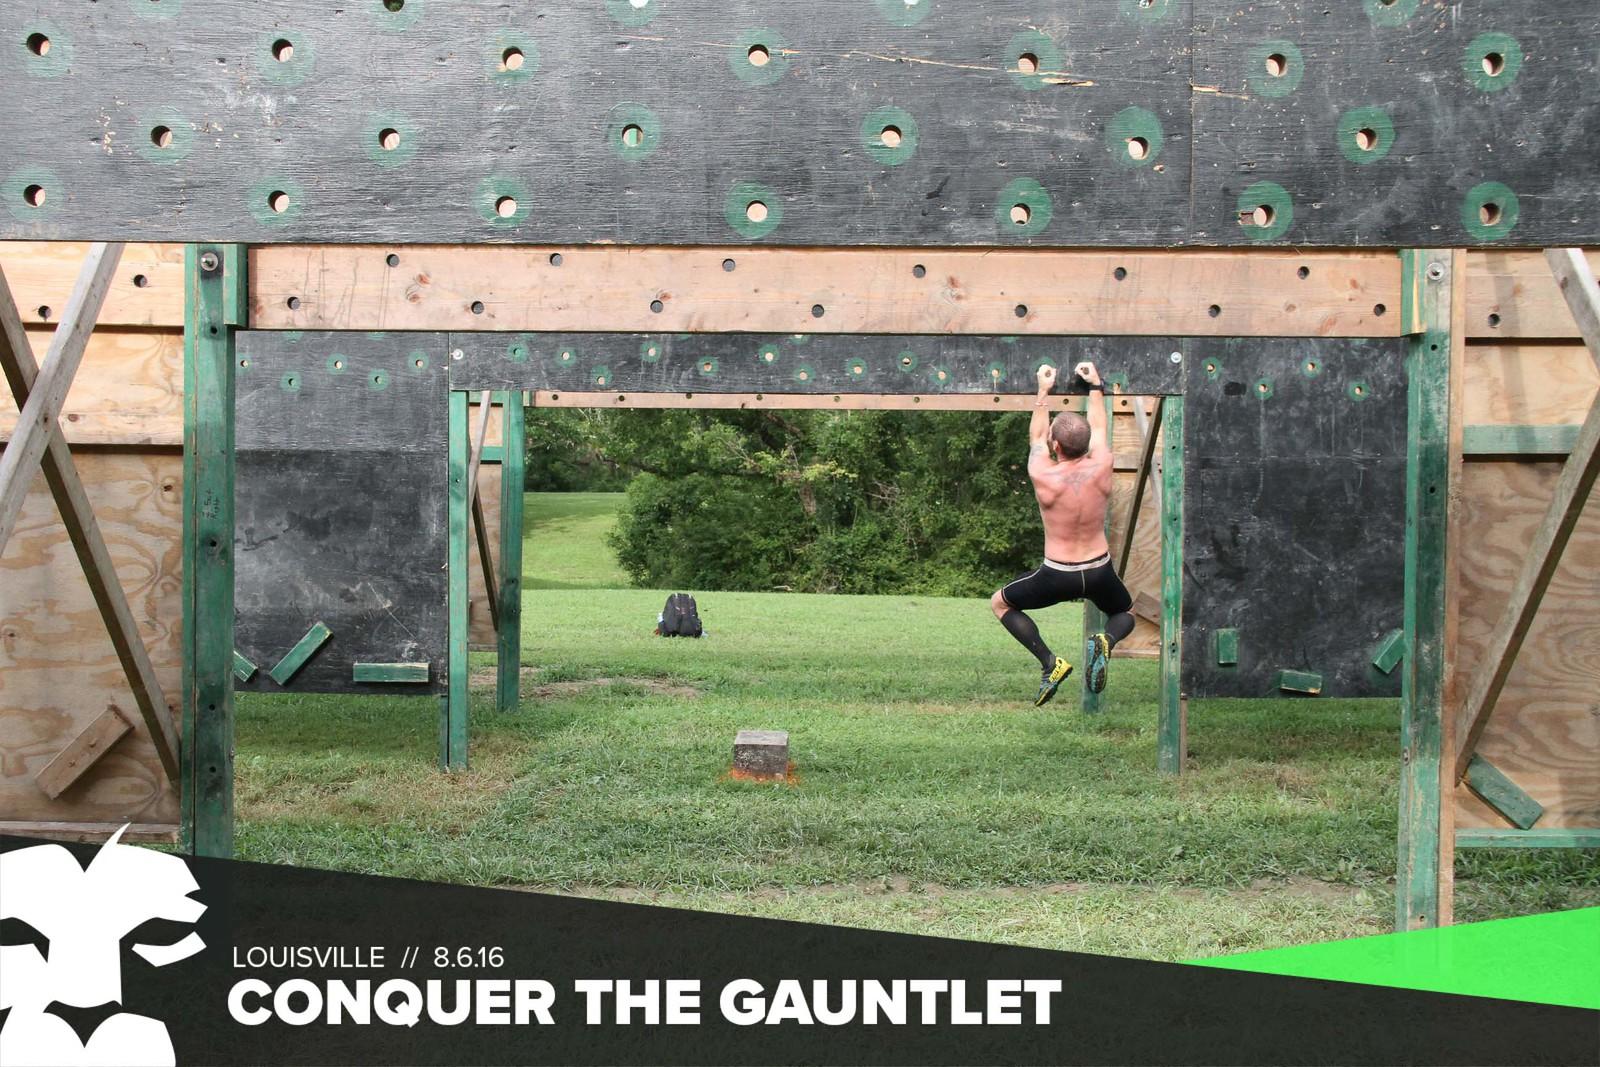 Conquer-The-Gauntlet-Louisville-2016-Pegatron